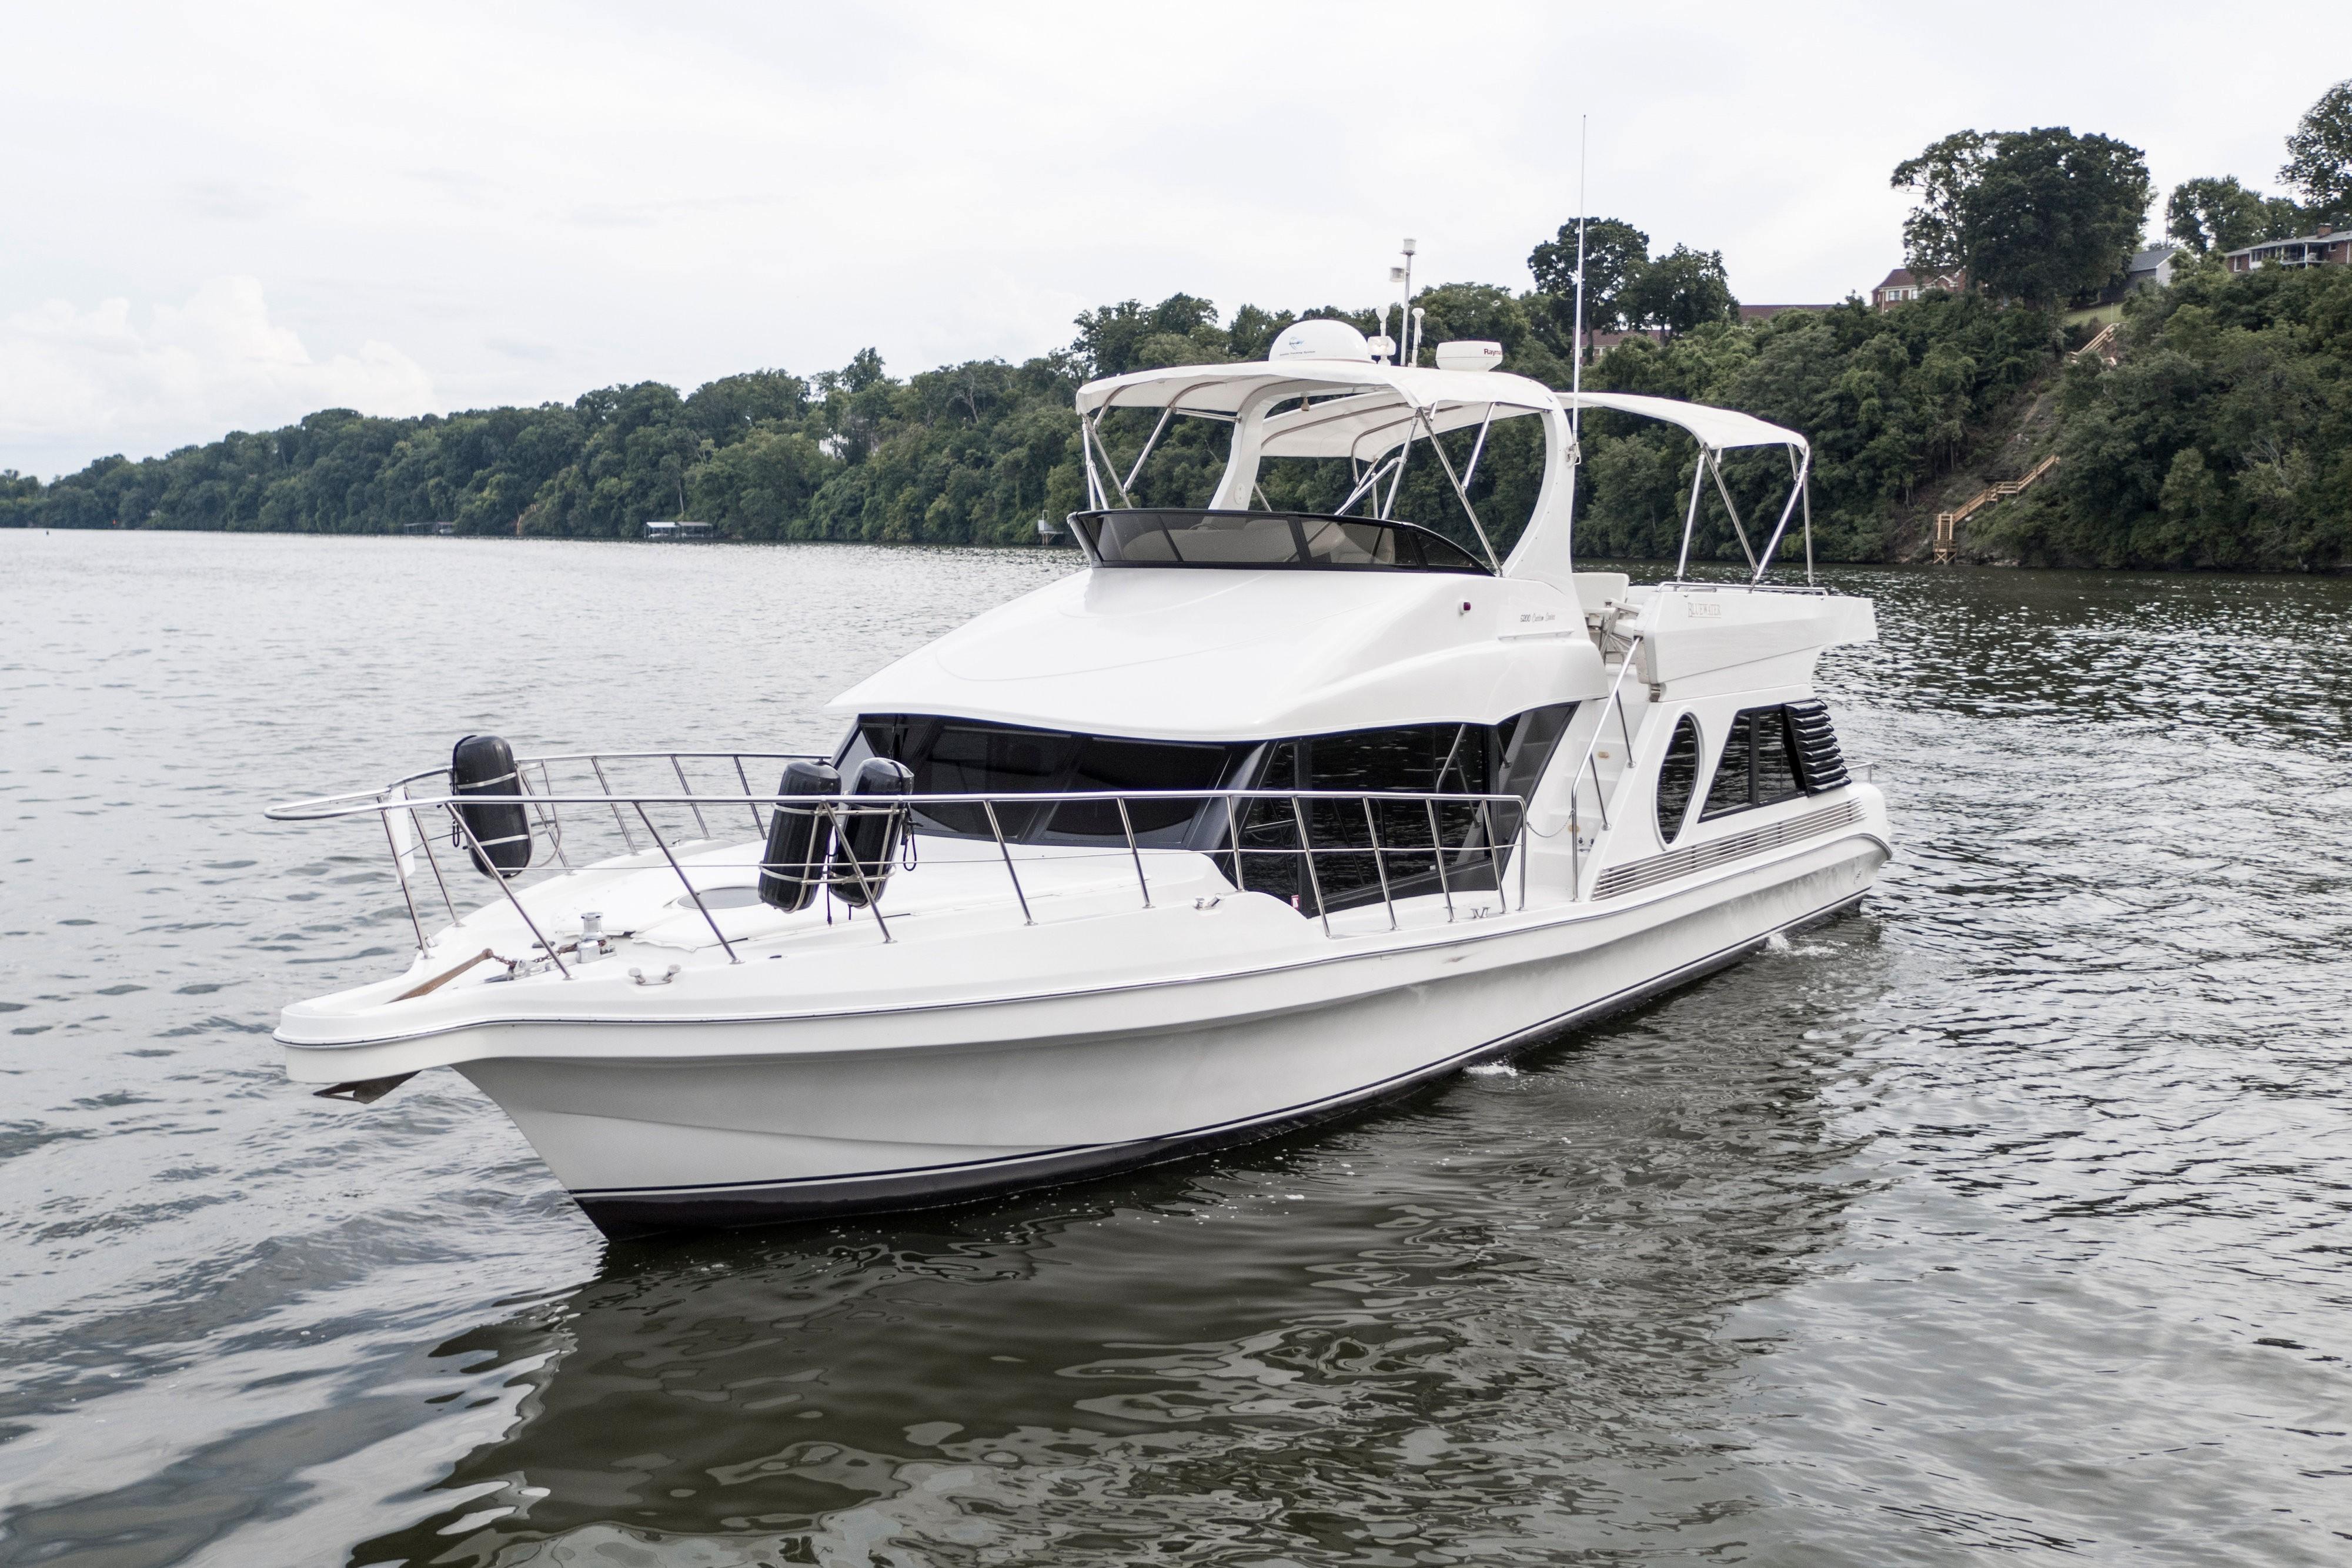 2002 Bluewater Yachts 5200 LE Custom Power Boat For Sale Wwwyachtworldcom